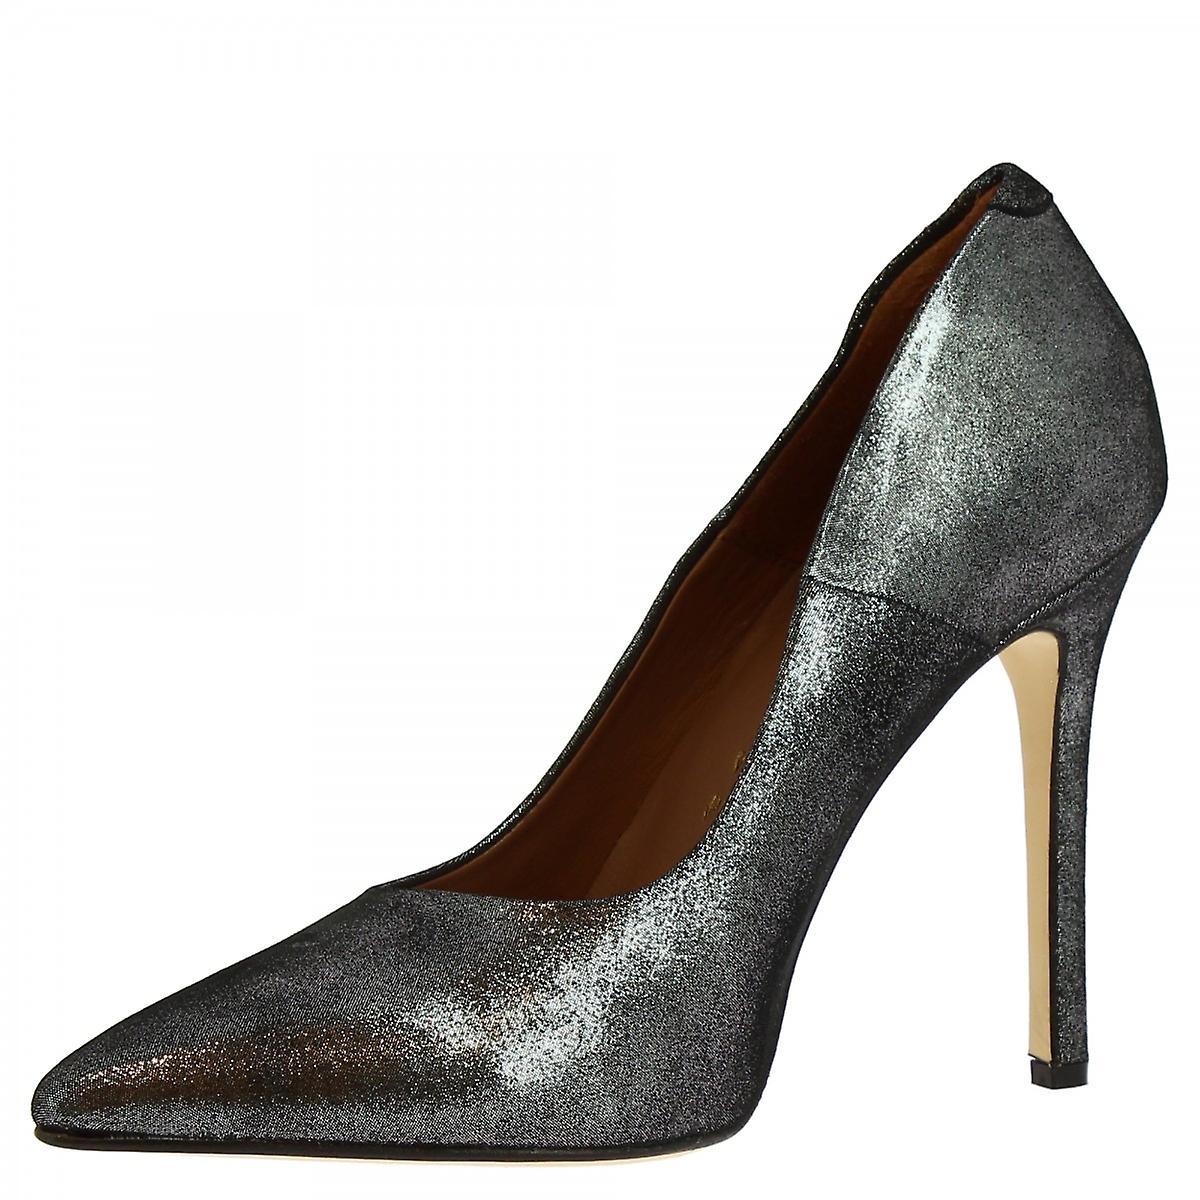 Leonardo Shoes Women's Handmade High Heels Pumps Silver Laminated Leather